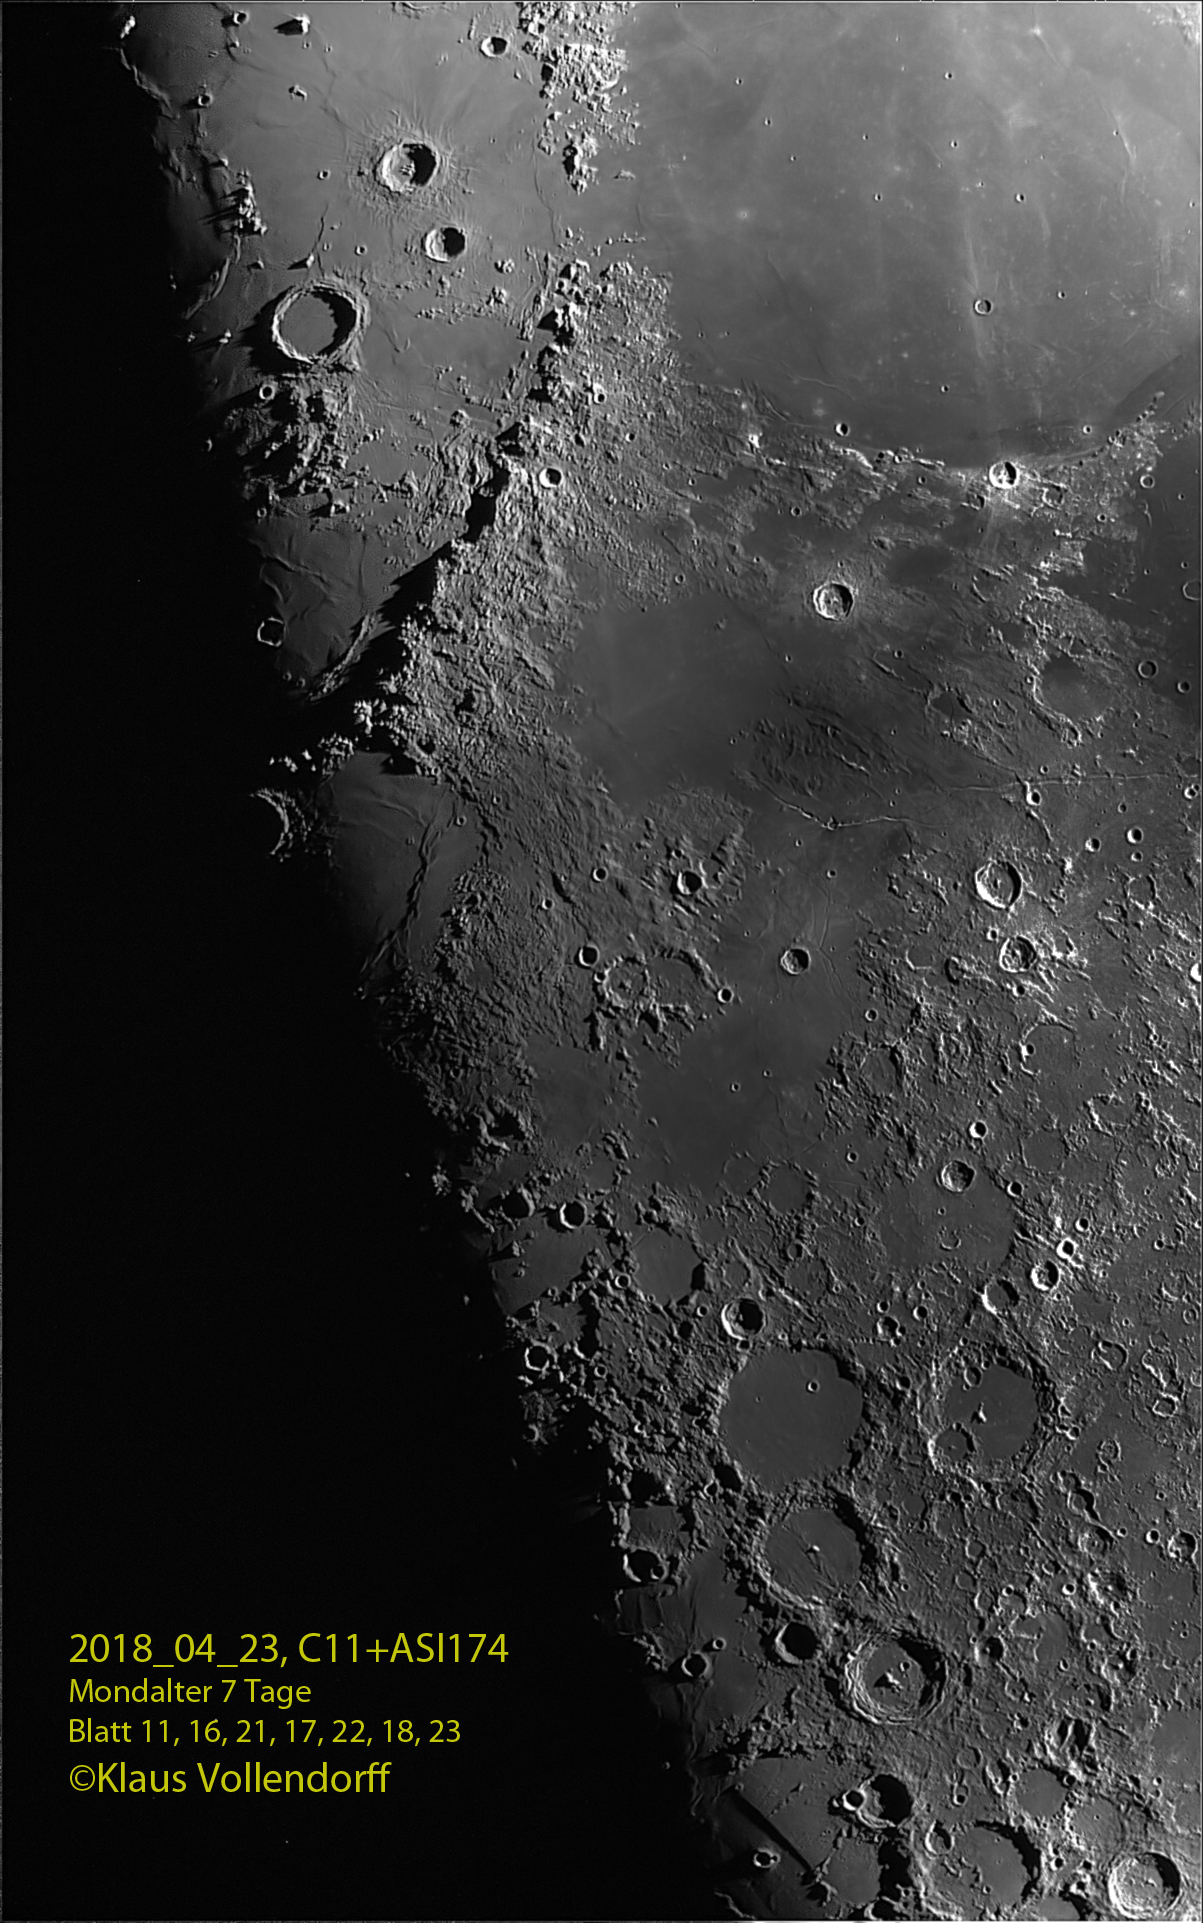 Montes Apenninus bis Ptolemaeus